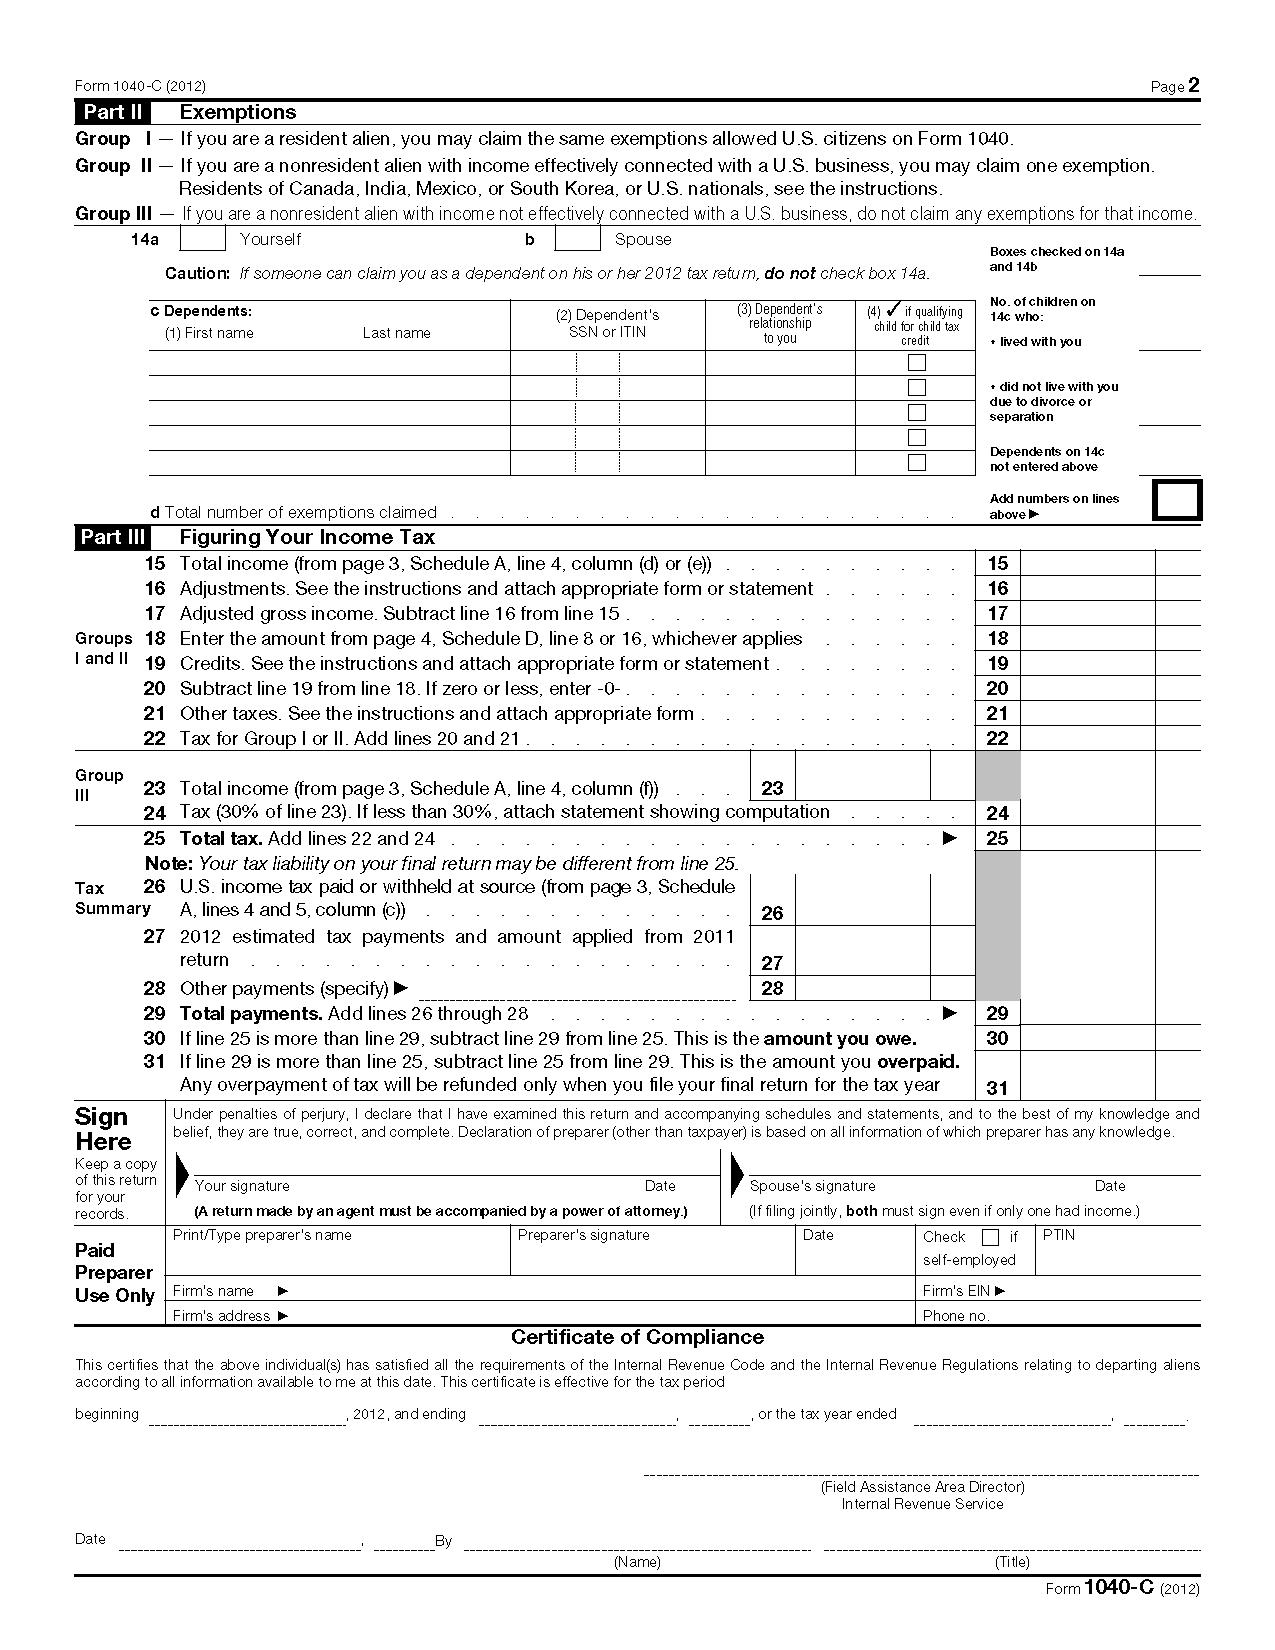 1040ez 2010 Form Printable